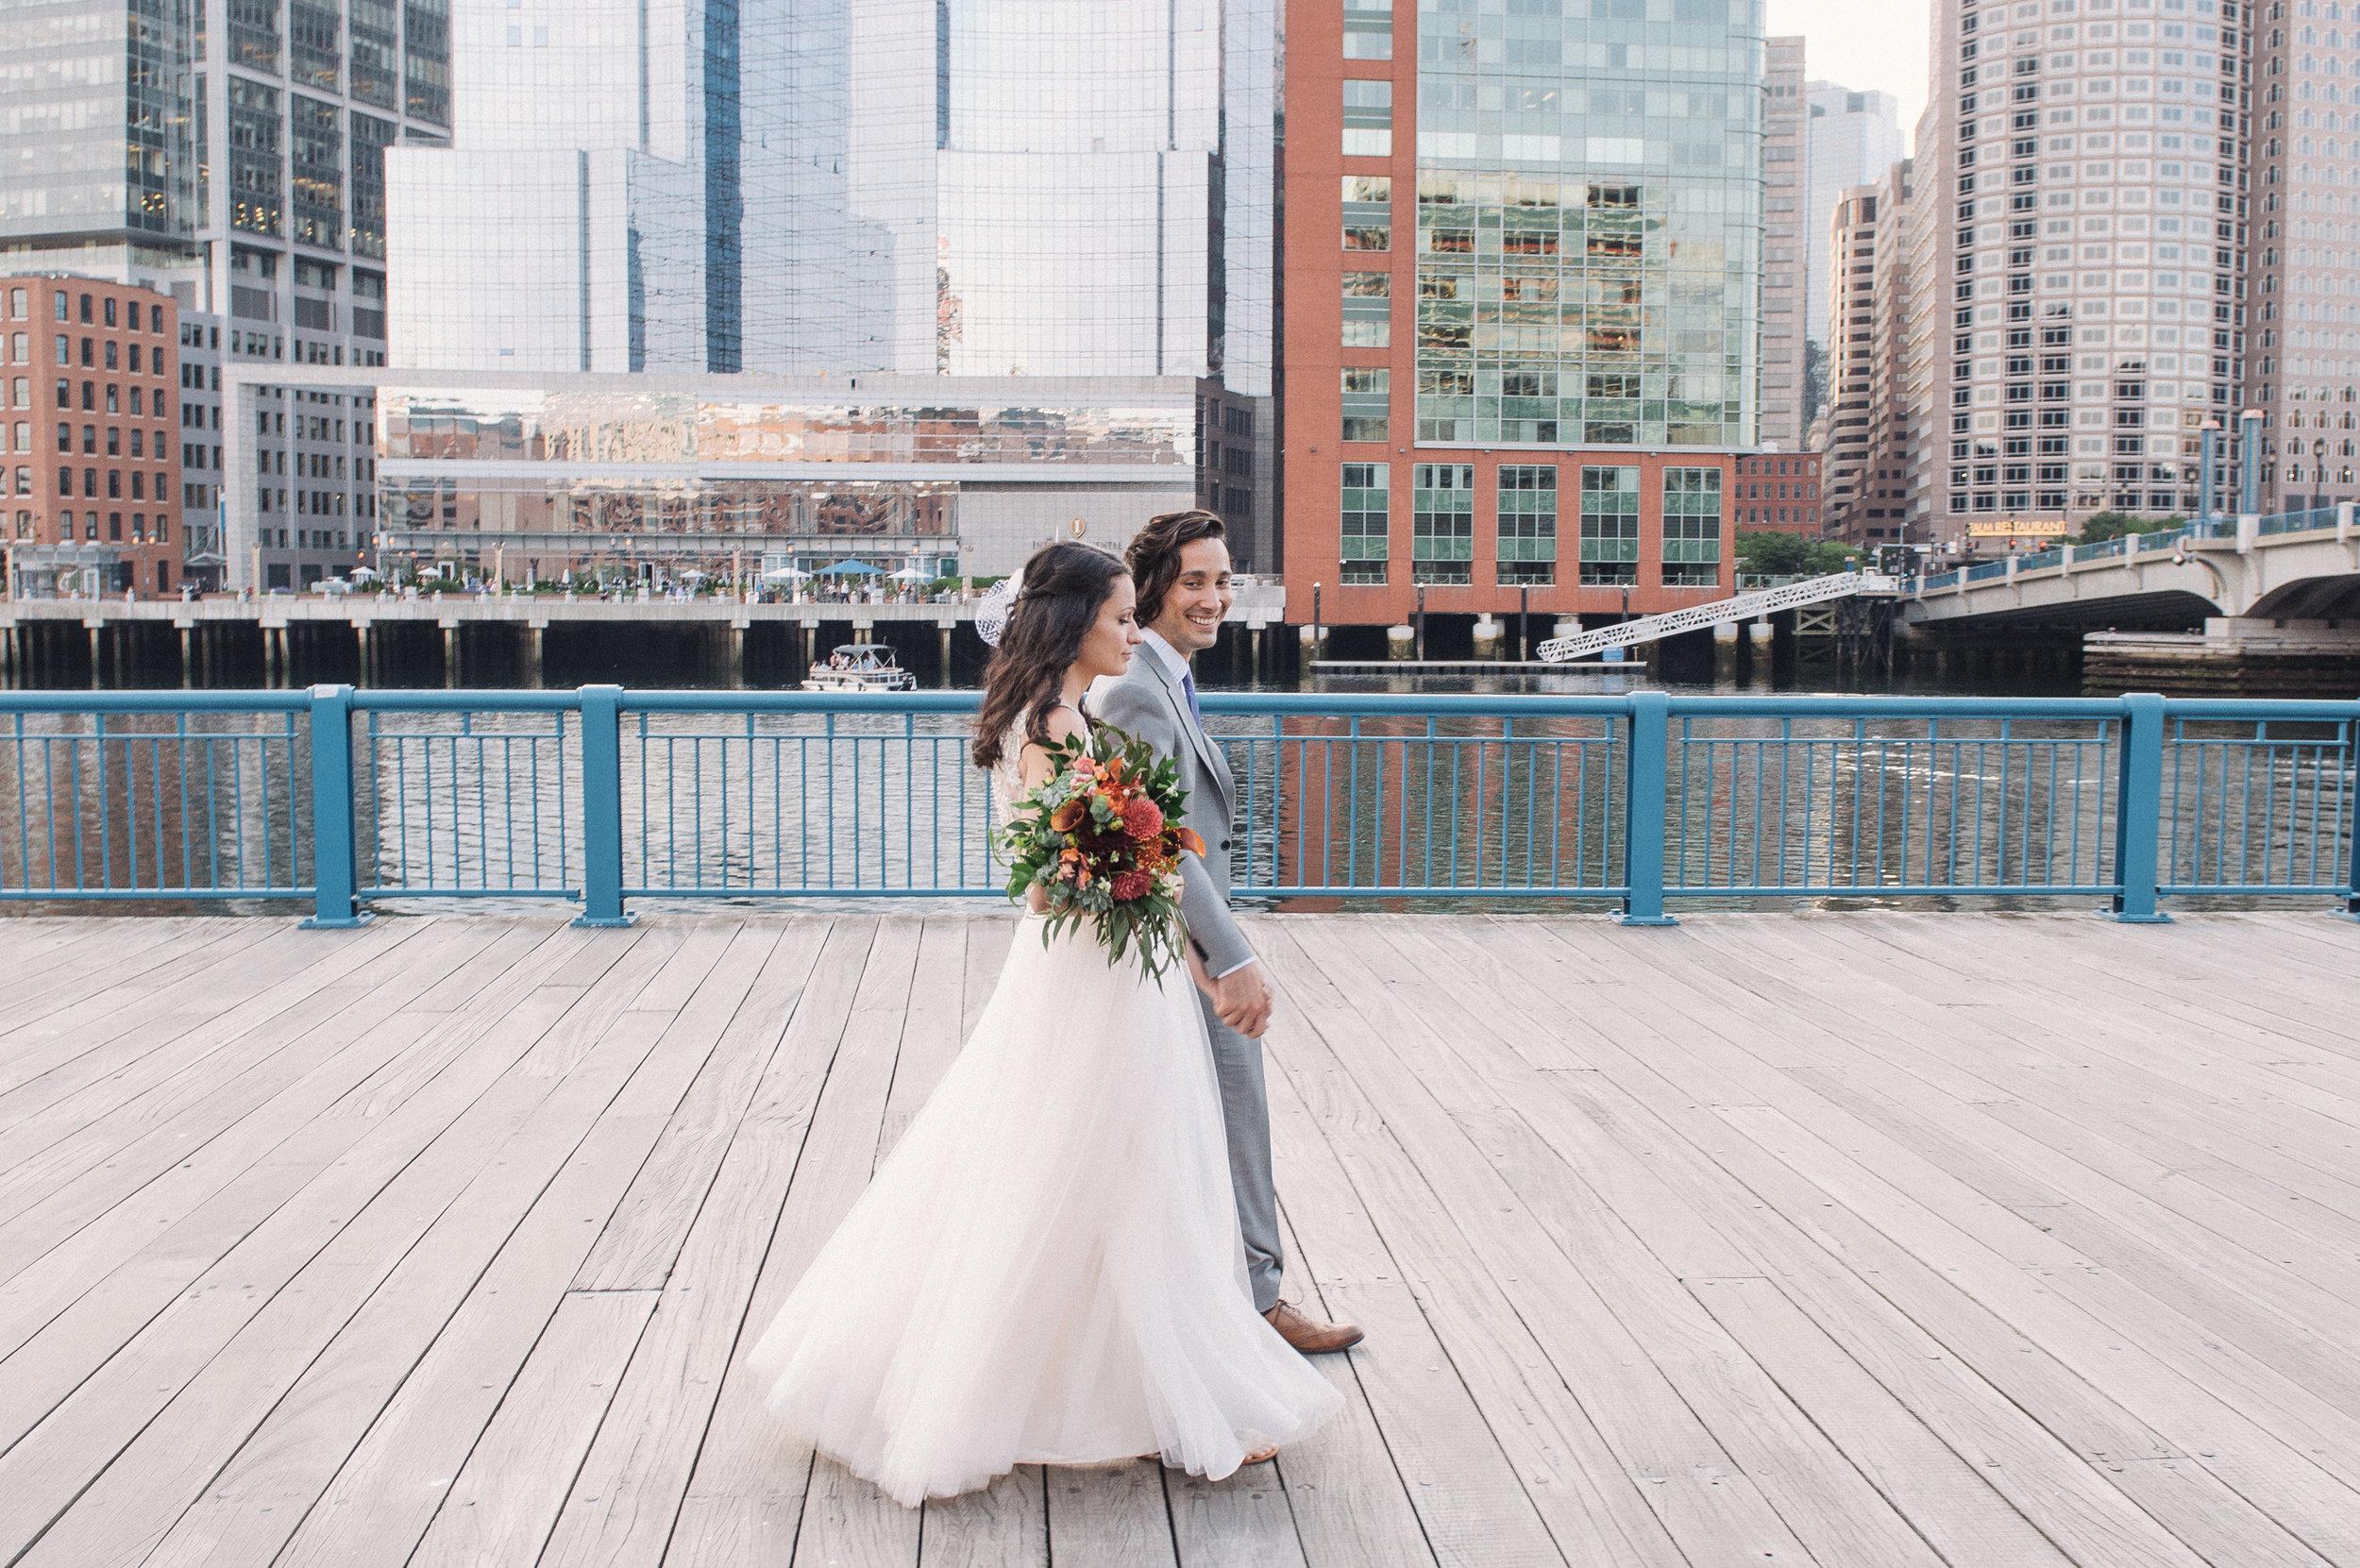 Weddings_BradRaquel_©meghanireland2016_37.jpg